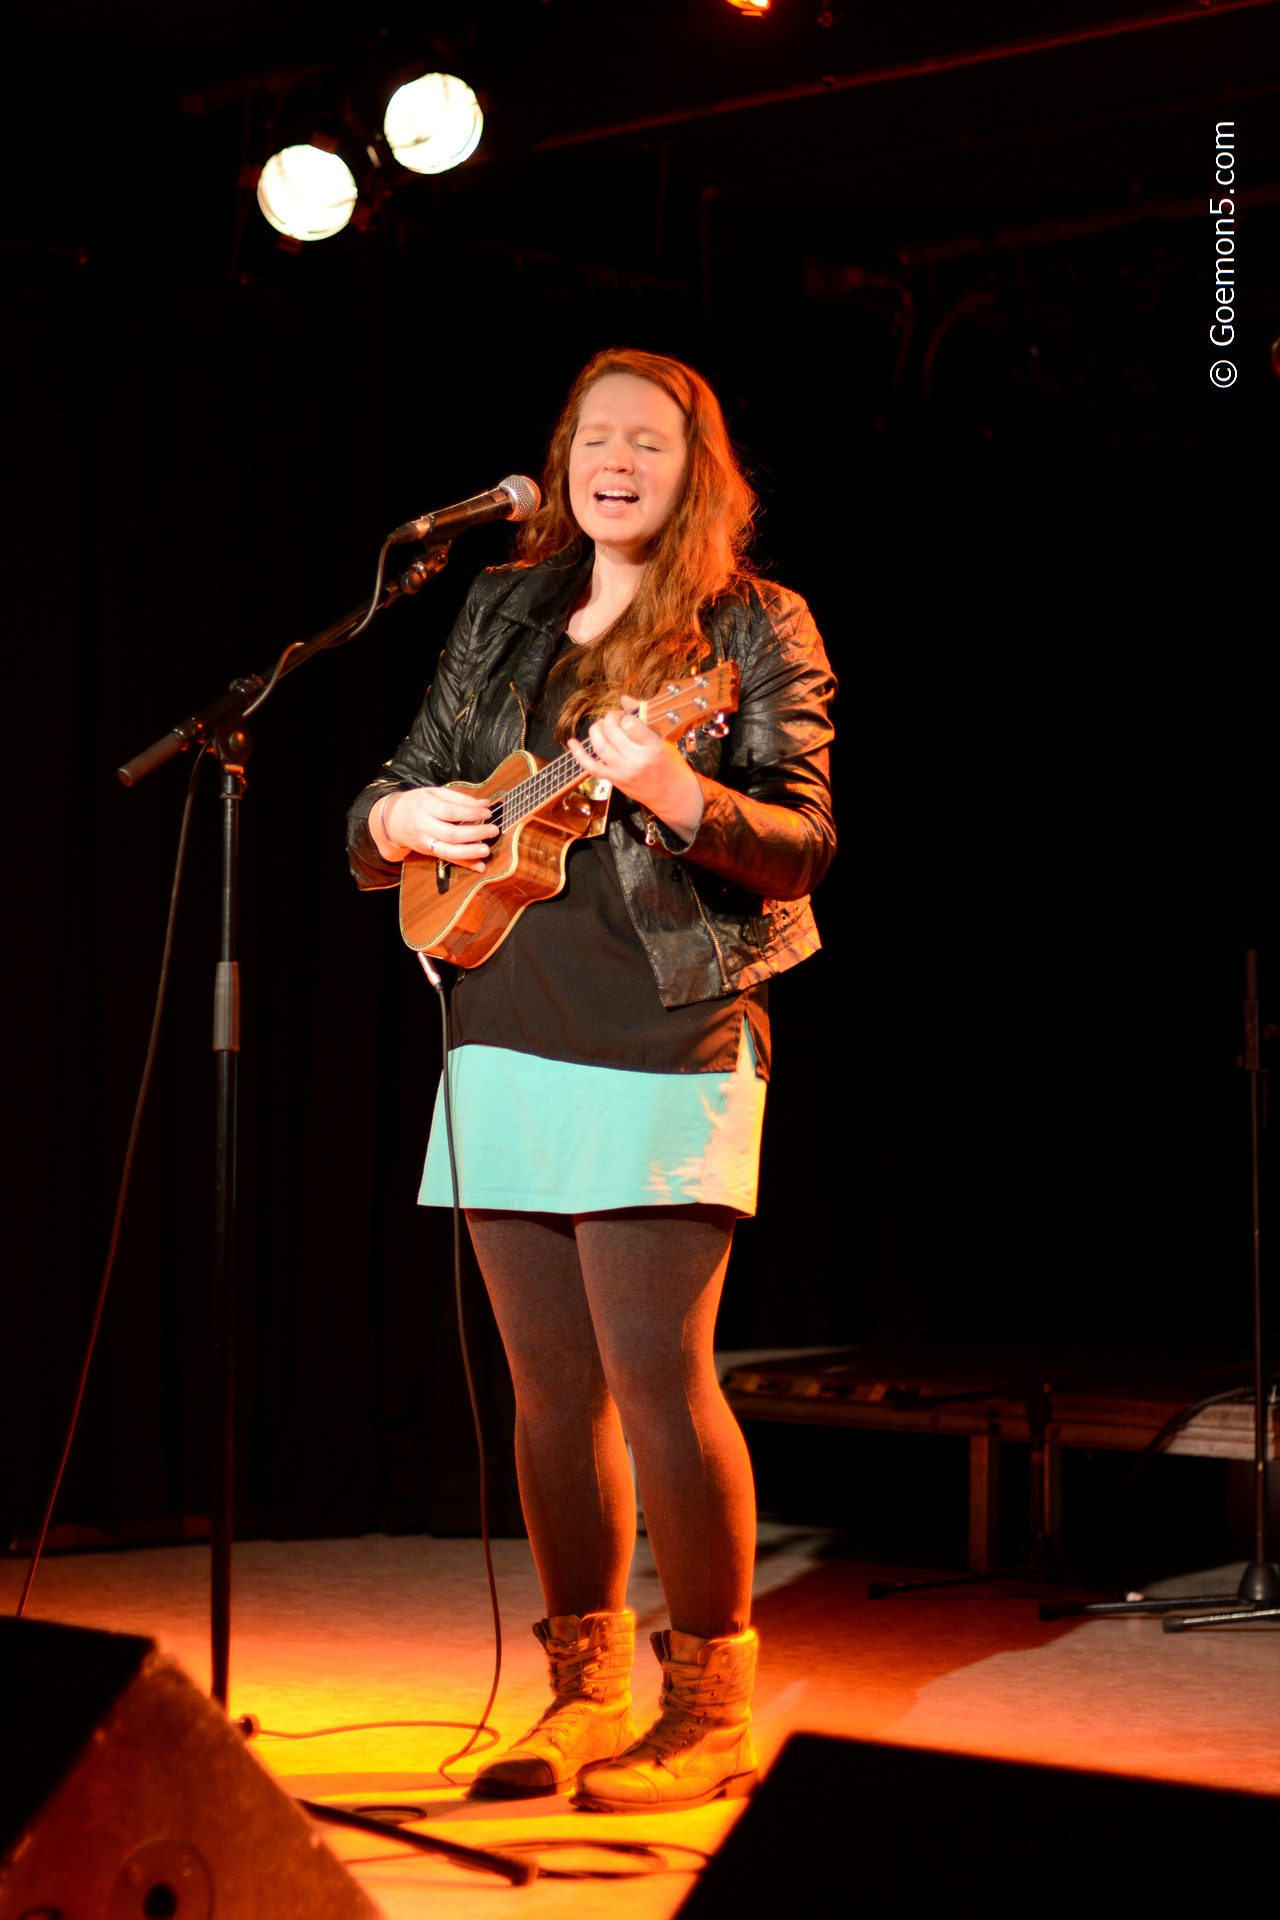 Kelsey Brae at ParkClub 6